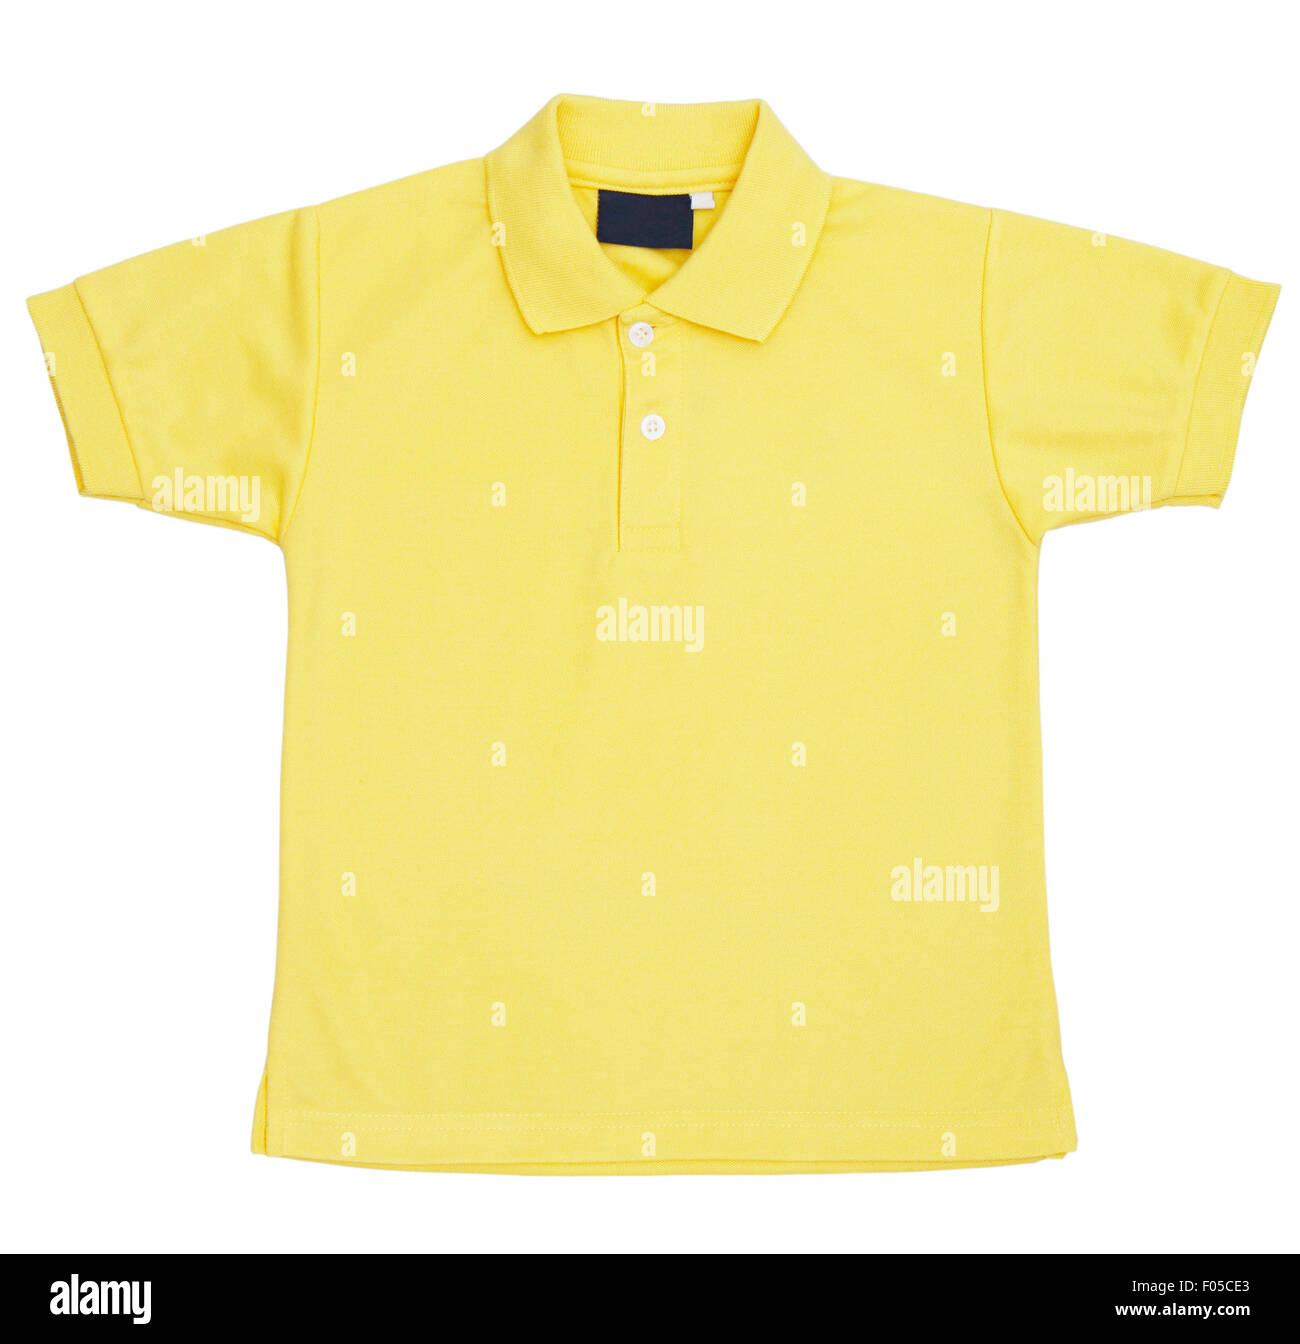 Yellow Polo Shirt Stock Photos   Yellow Polo Shirt Stock Images - Alamy 0e1a9bcef9f2d